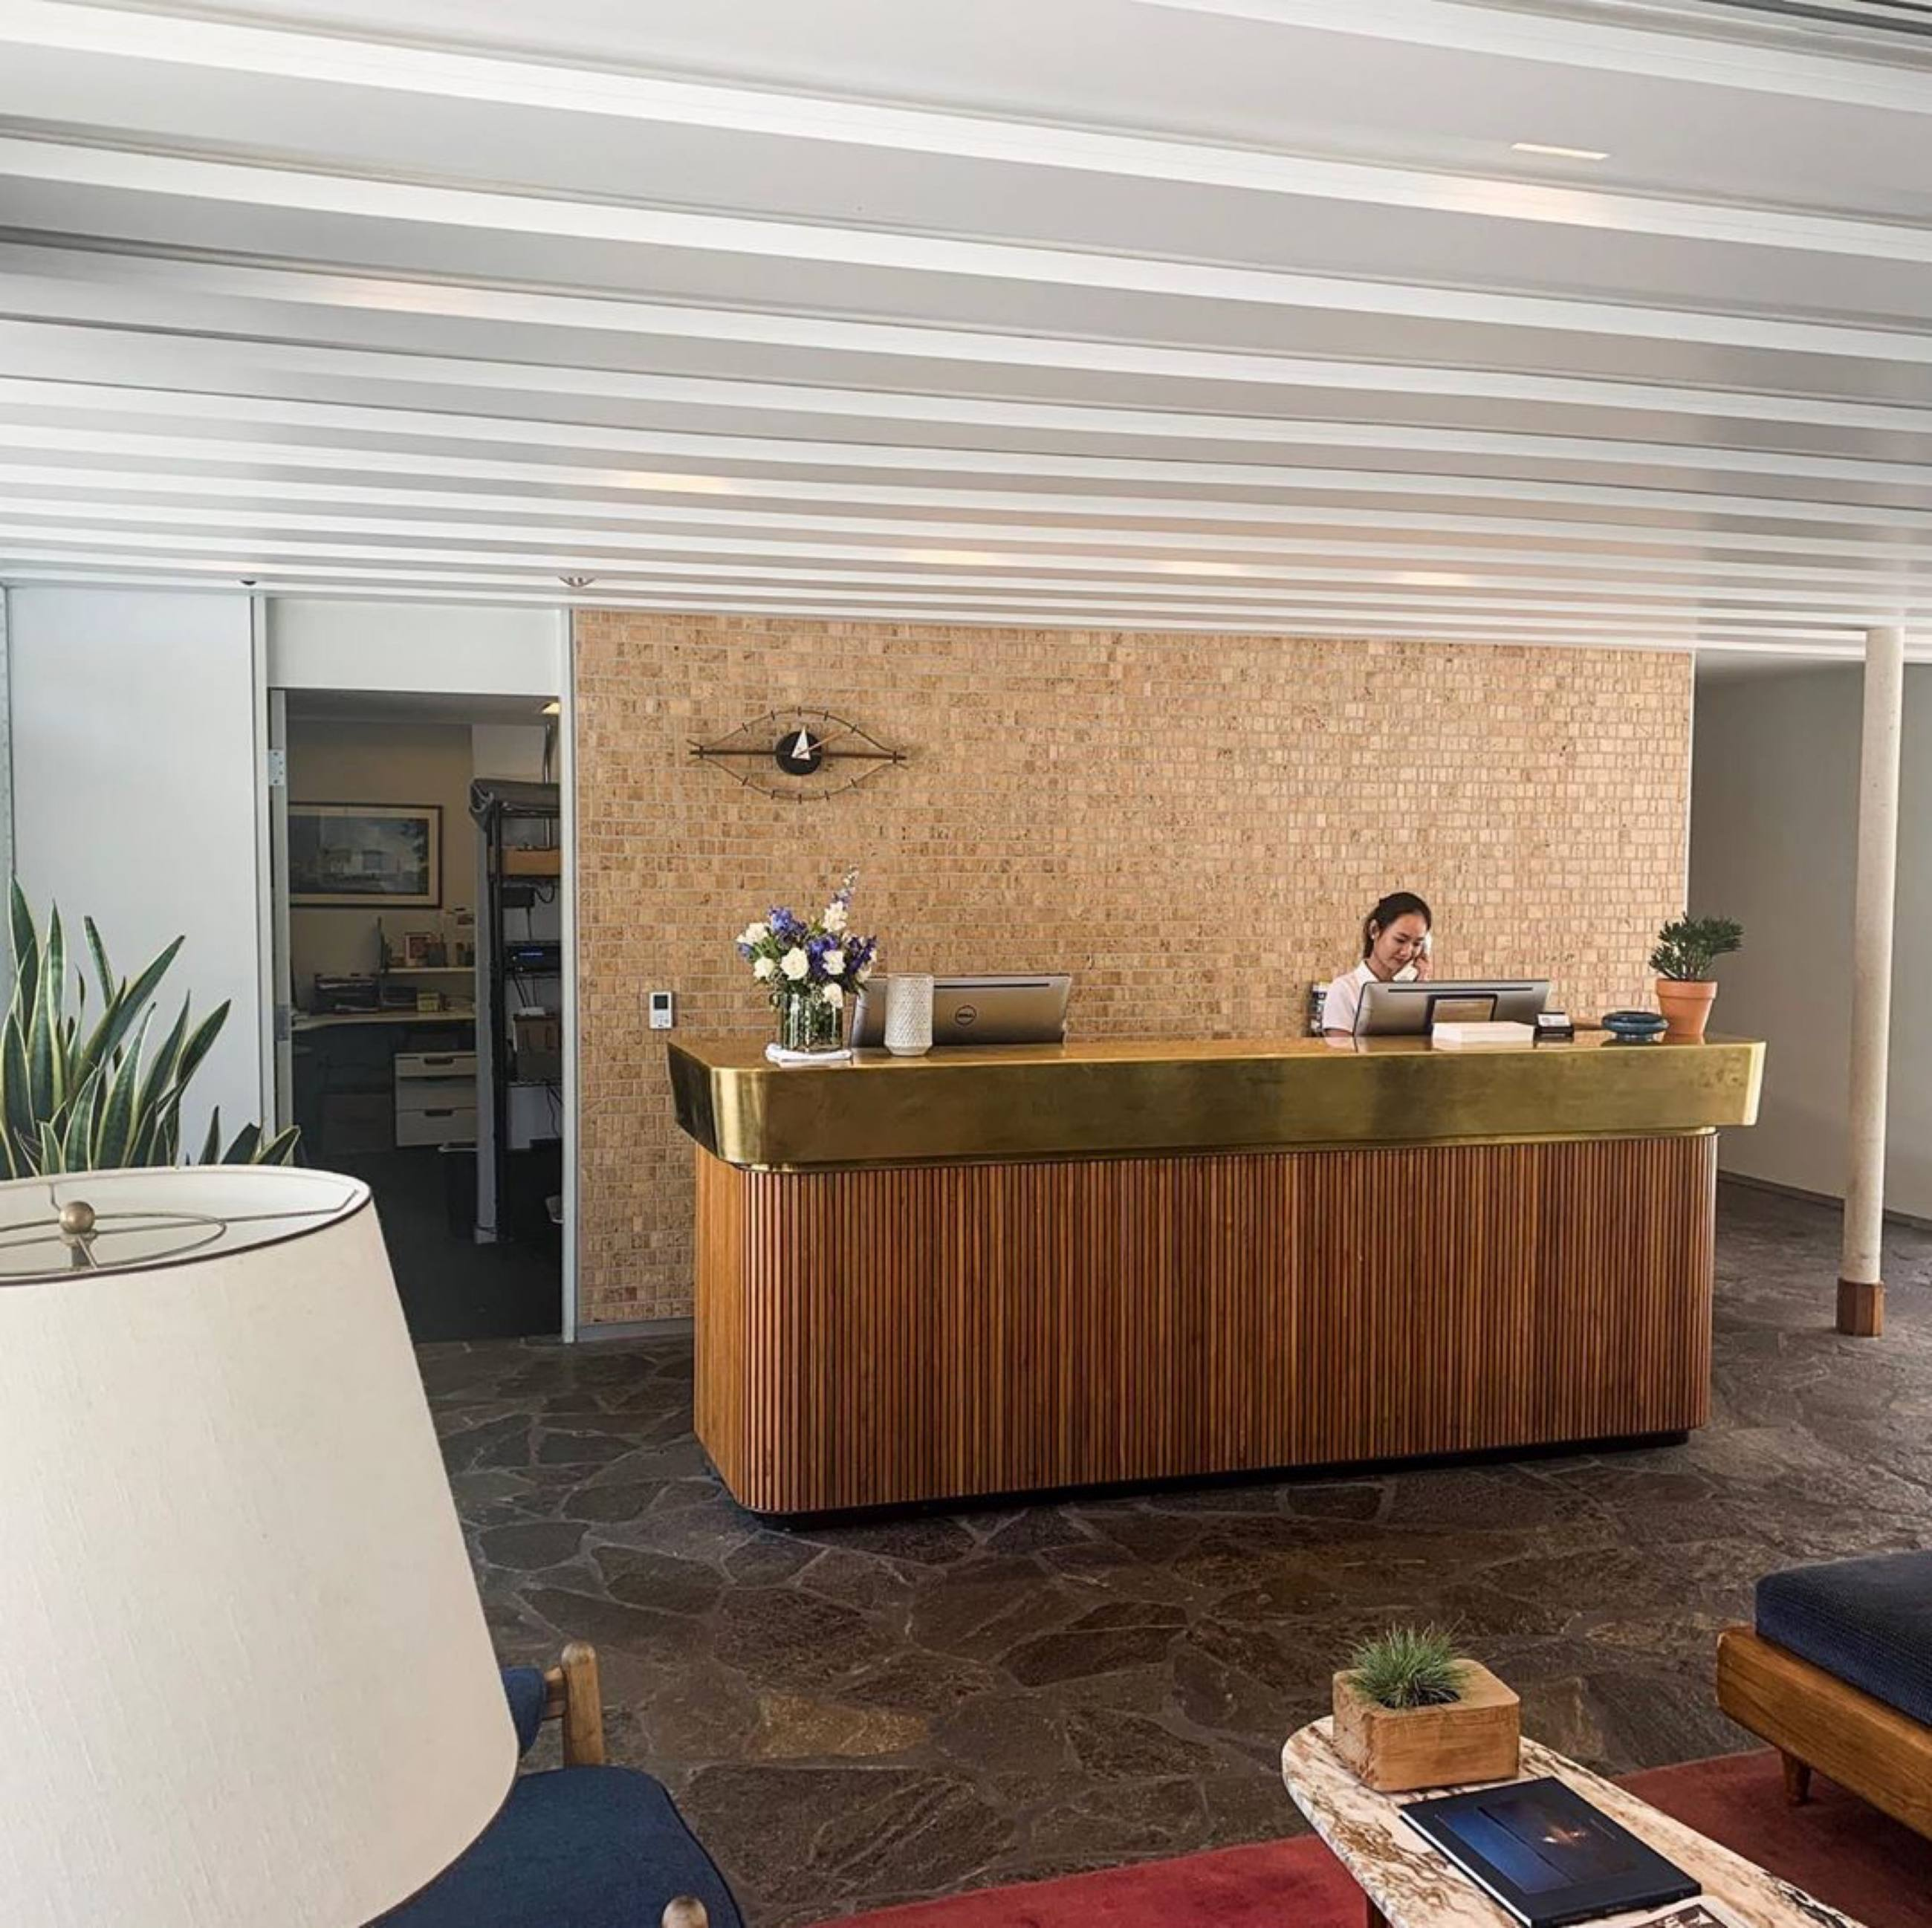 Lobby of the Beverly Laurel Motor Hotel